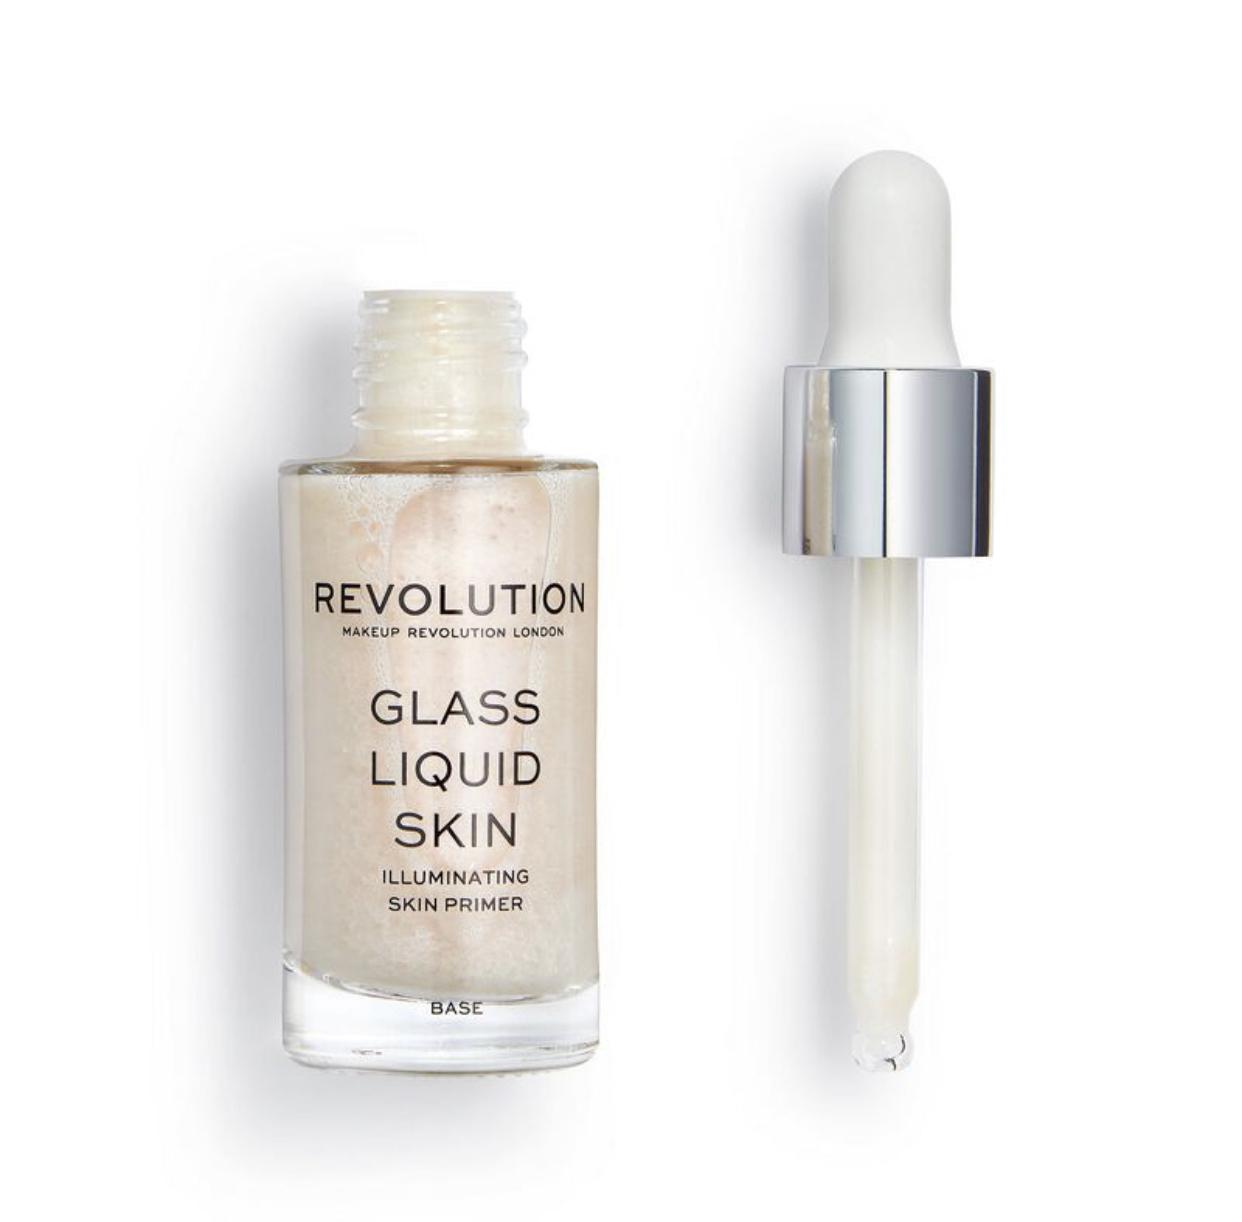 Revolution Glass Liquid Skin Illuminating Primer Serum